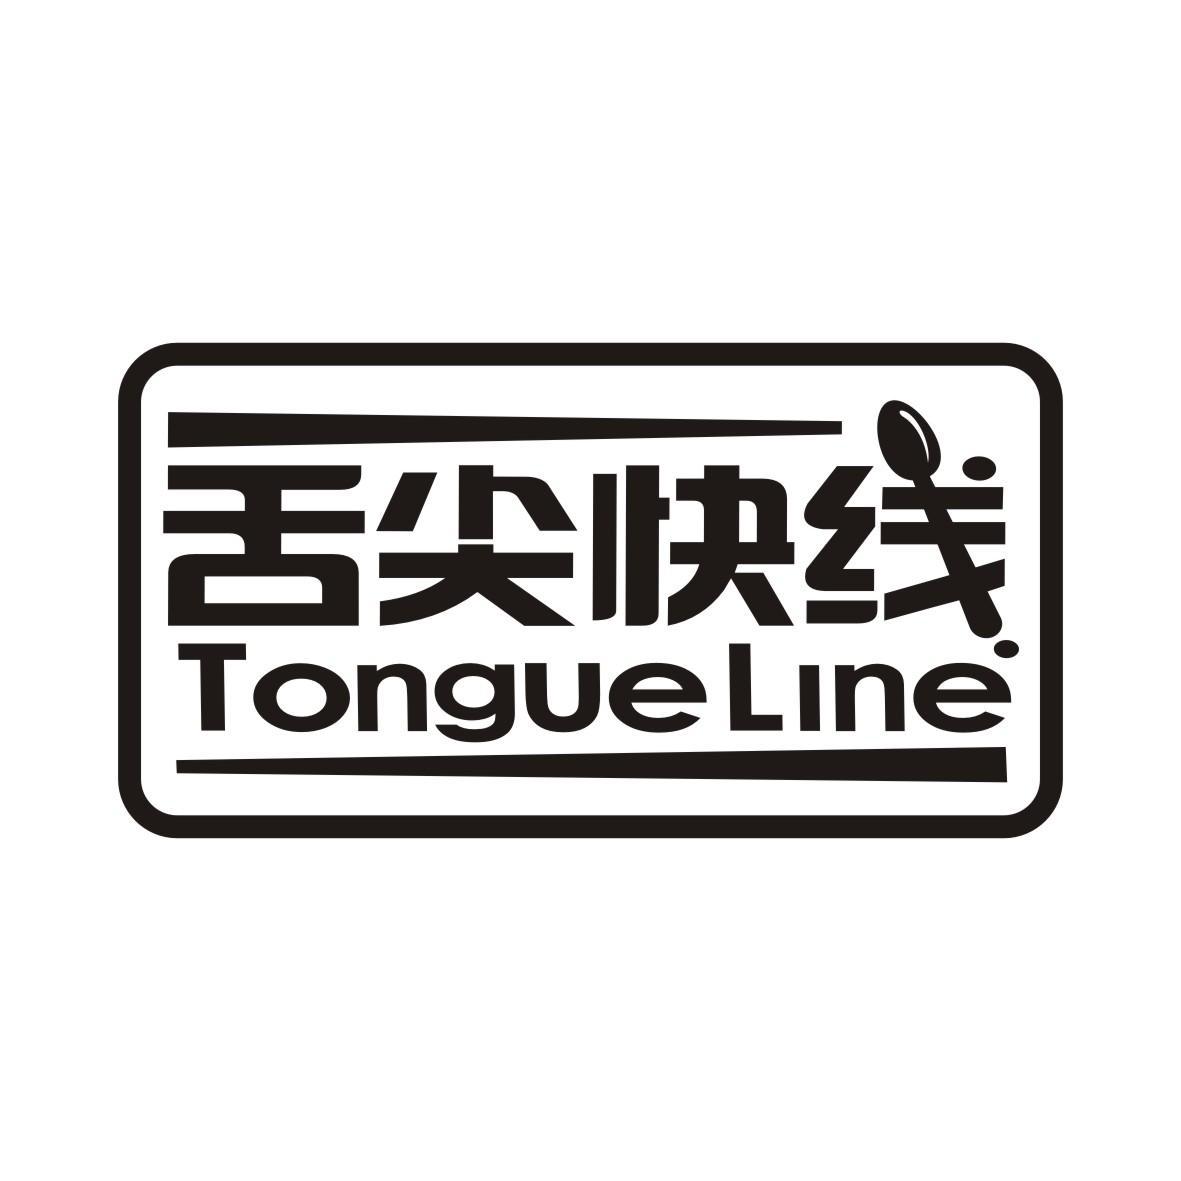 舌尖快线 TONGUE LINE